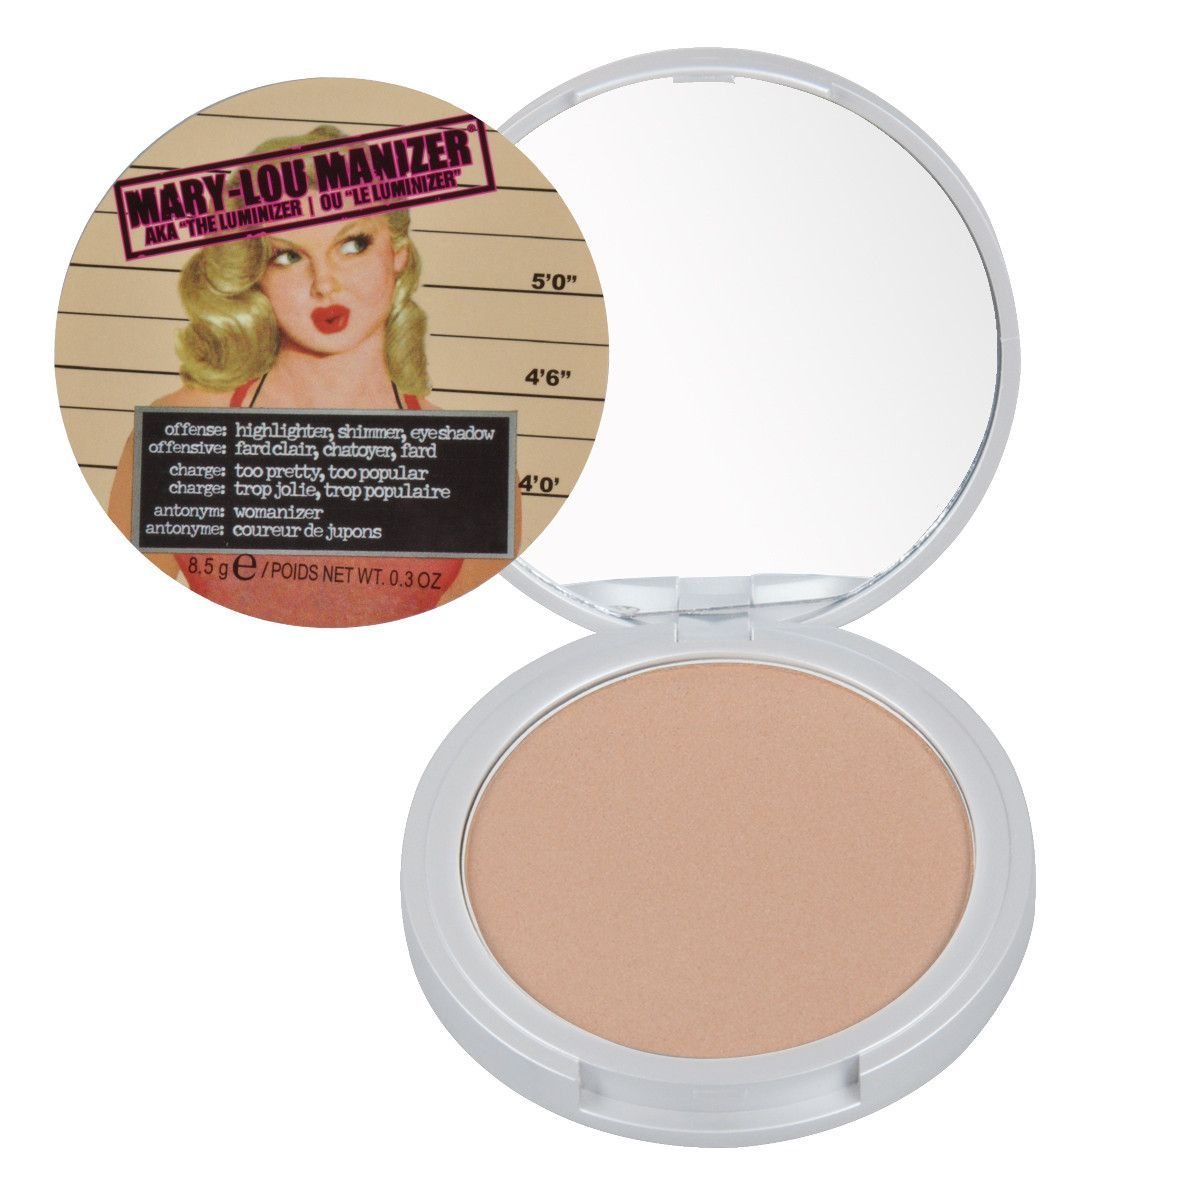 Makeup Powder Palette Manizer Highlight Face Pressed Powder Foundation Palette